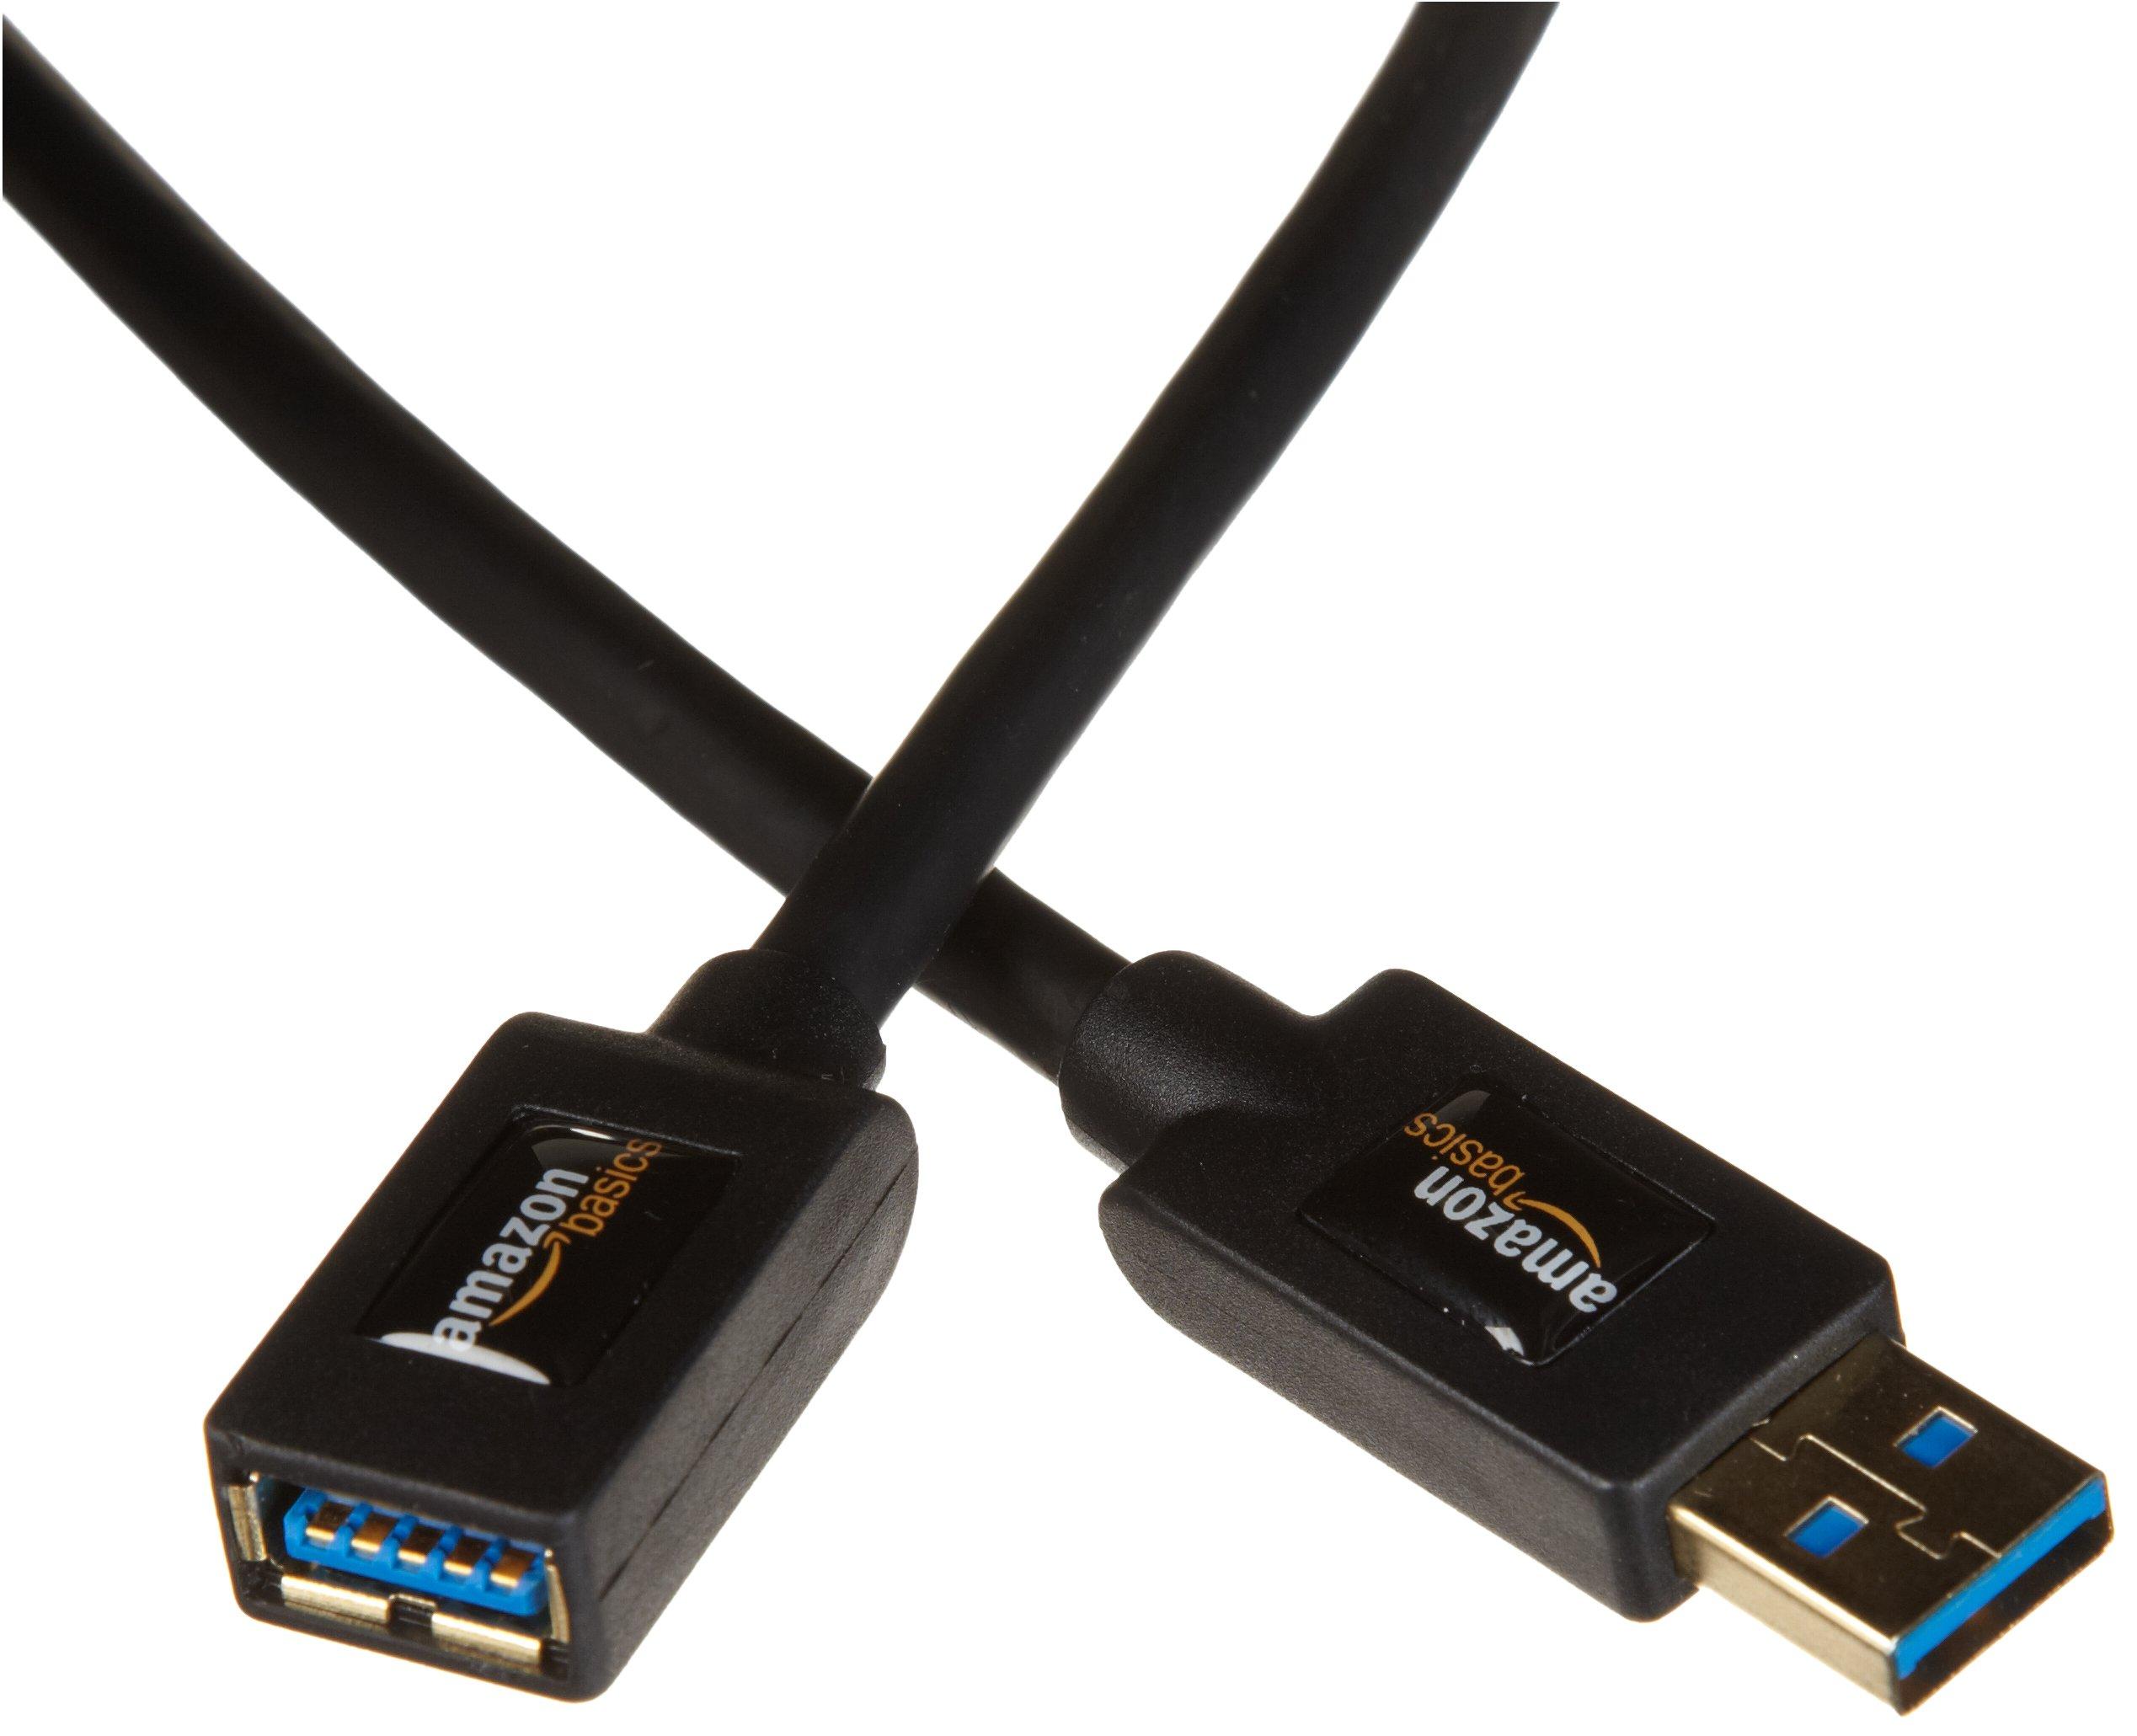 AmazonBasics USB 3.0-Verlängerungskabel A-Stecker auf A-Buchse, 2 m product image